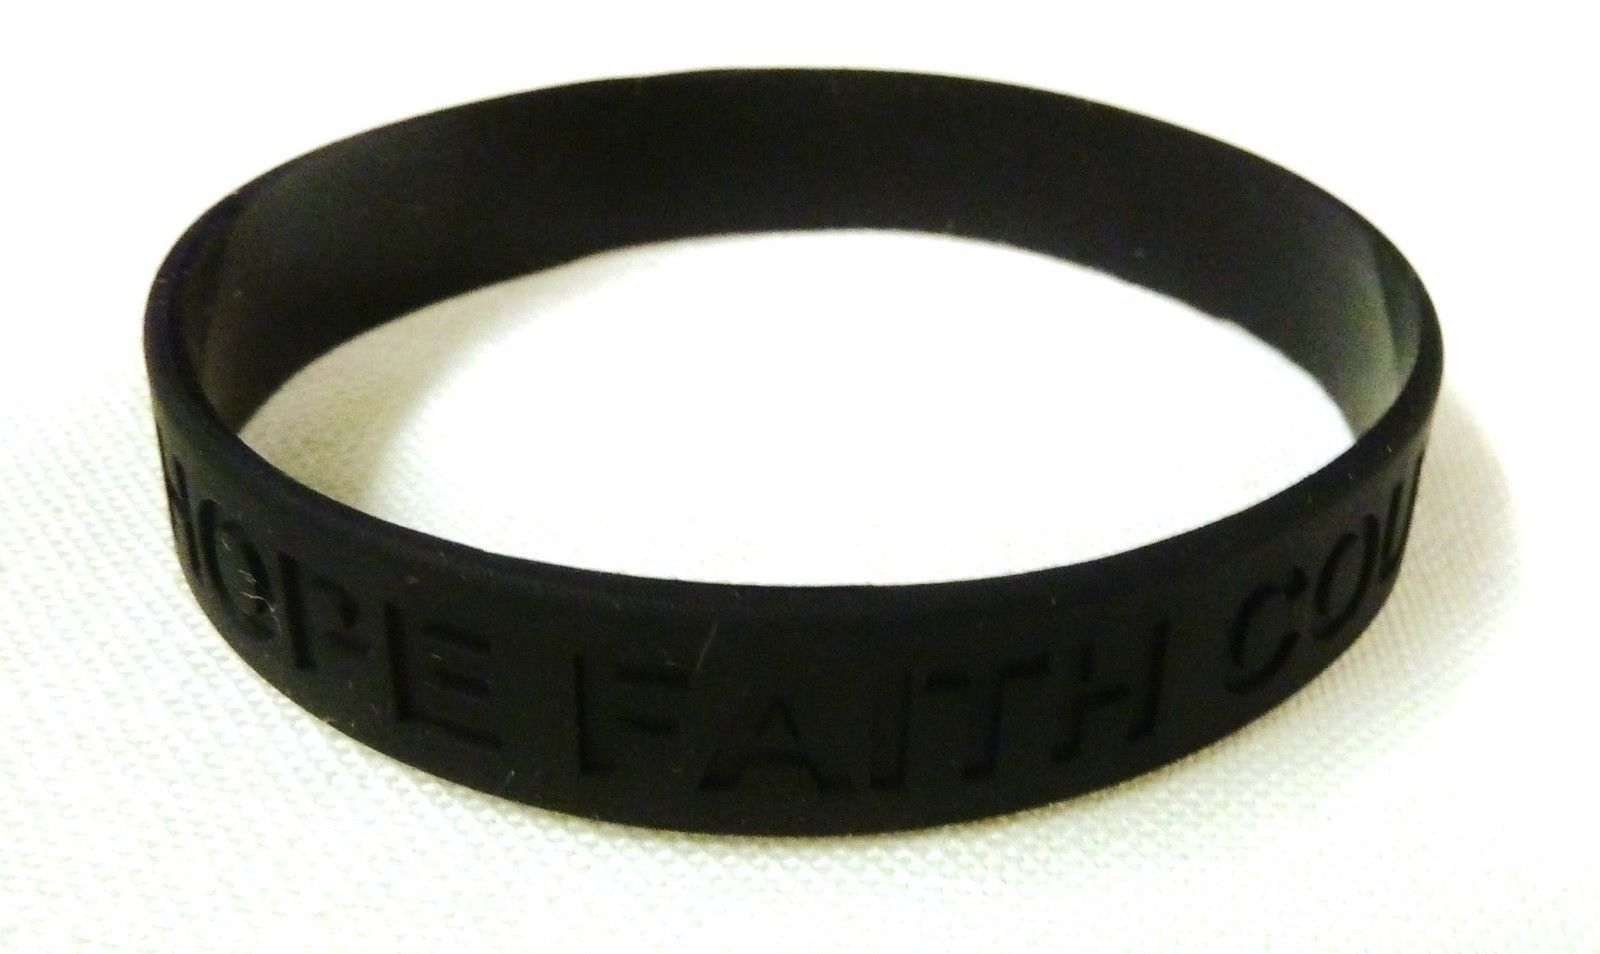 Black Awareness Bracelets 100 Piece Lot Hope Faith Courage Many Cancer Cause New